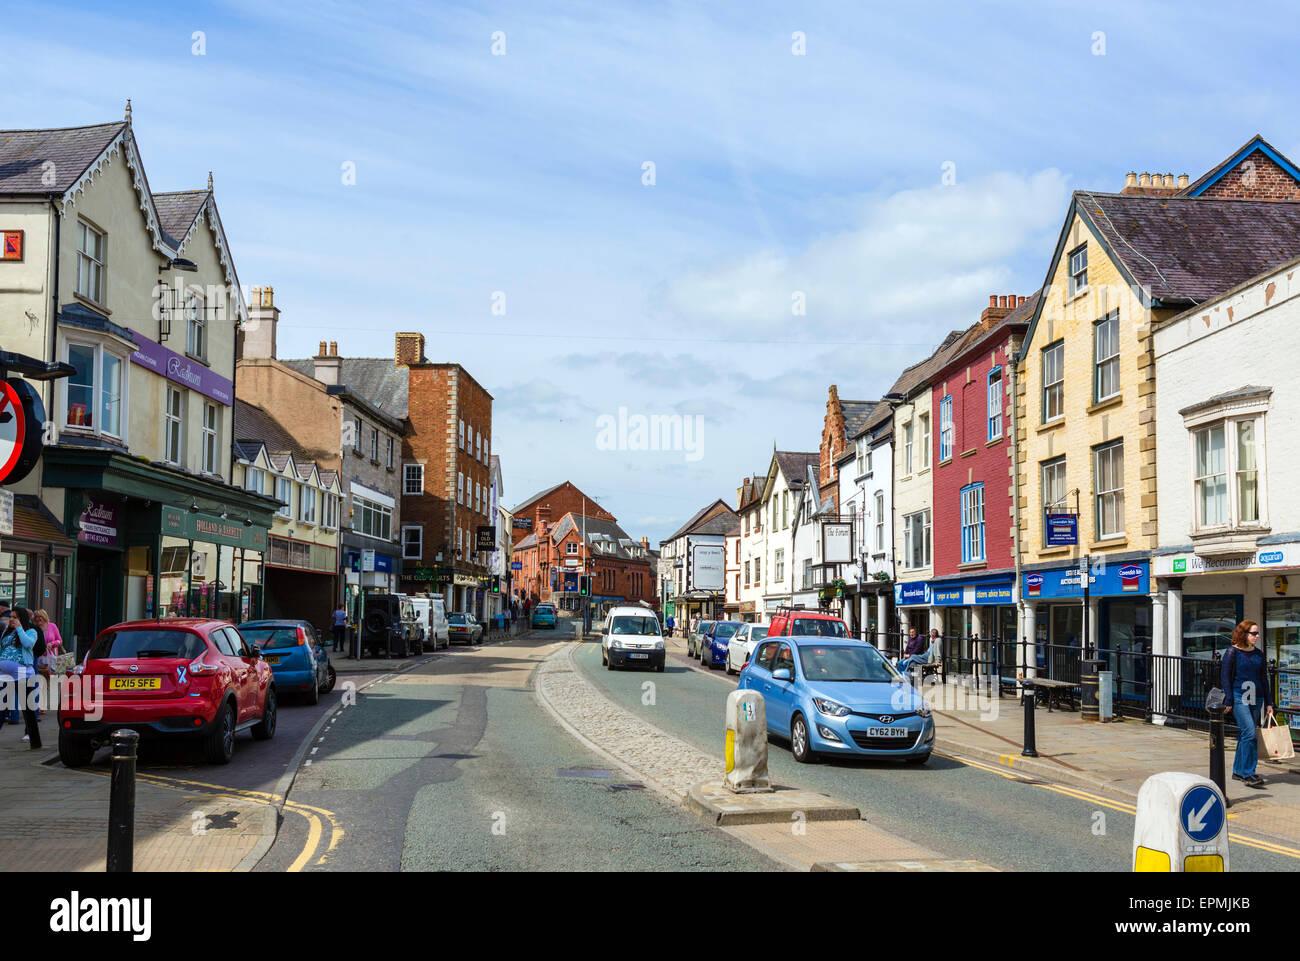 High Street in Denbigh, Denbighshire, Wales, UK - Stock Image